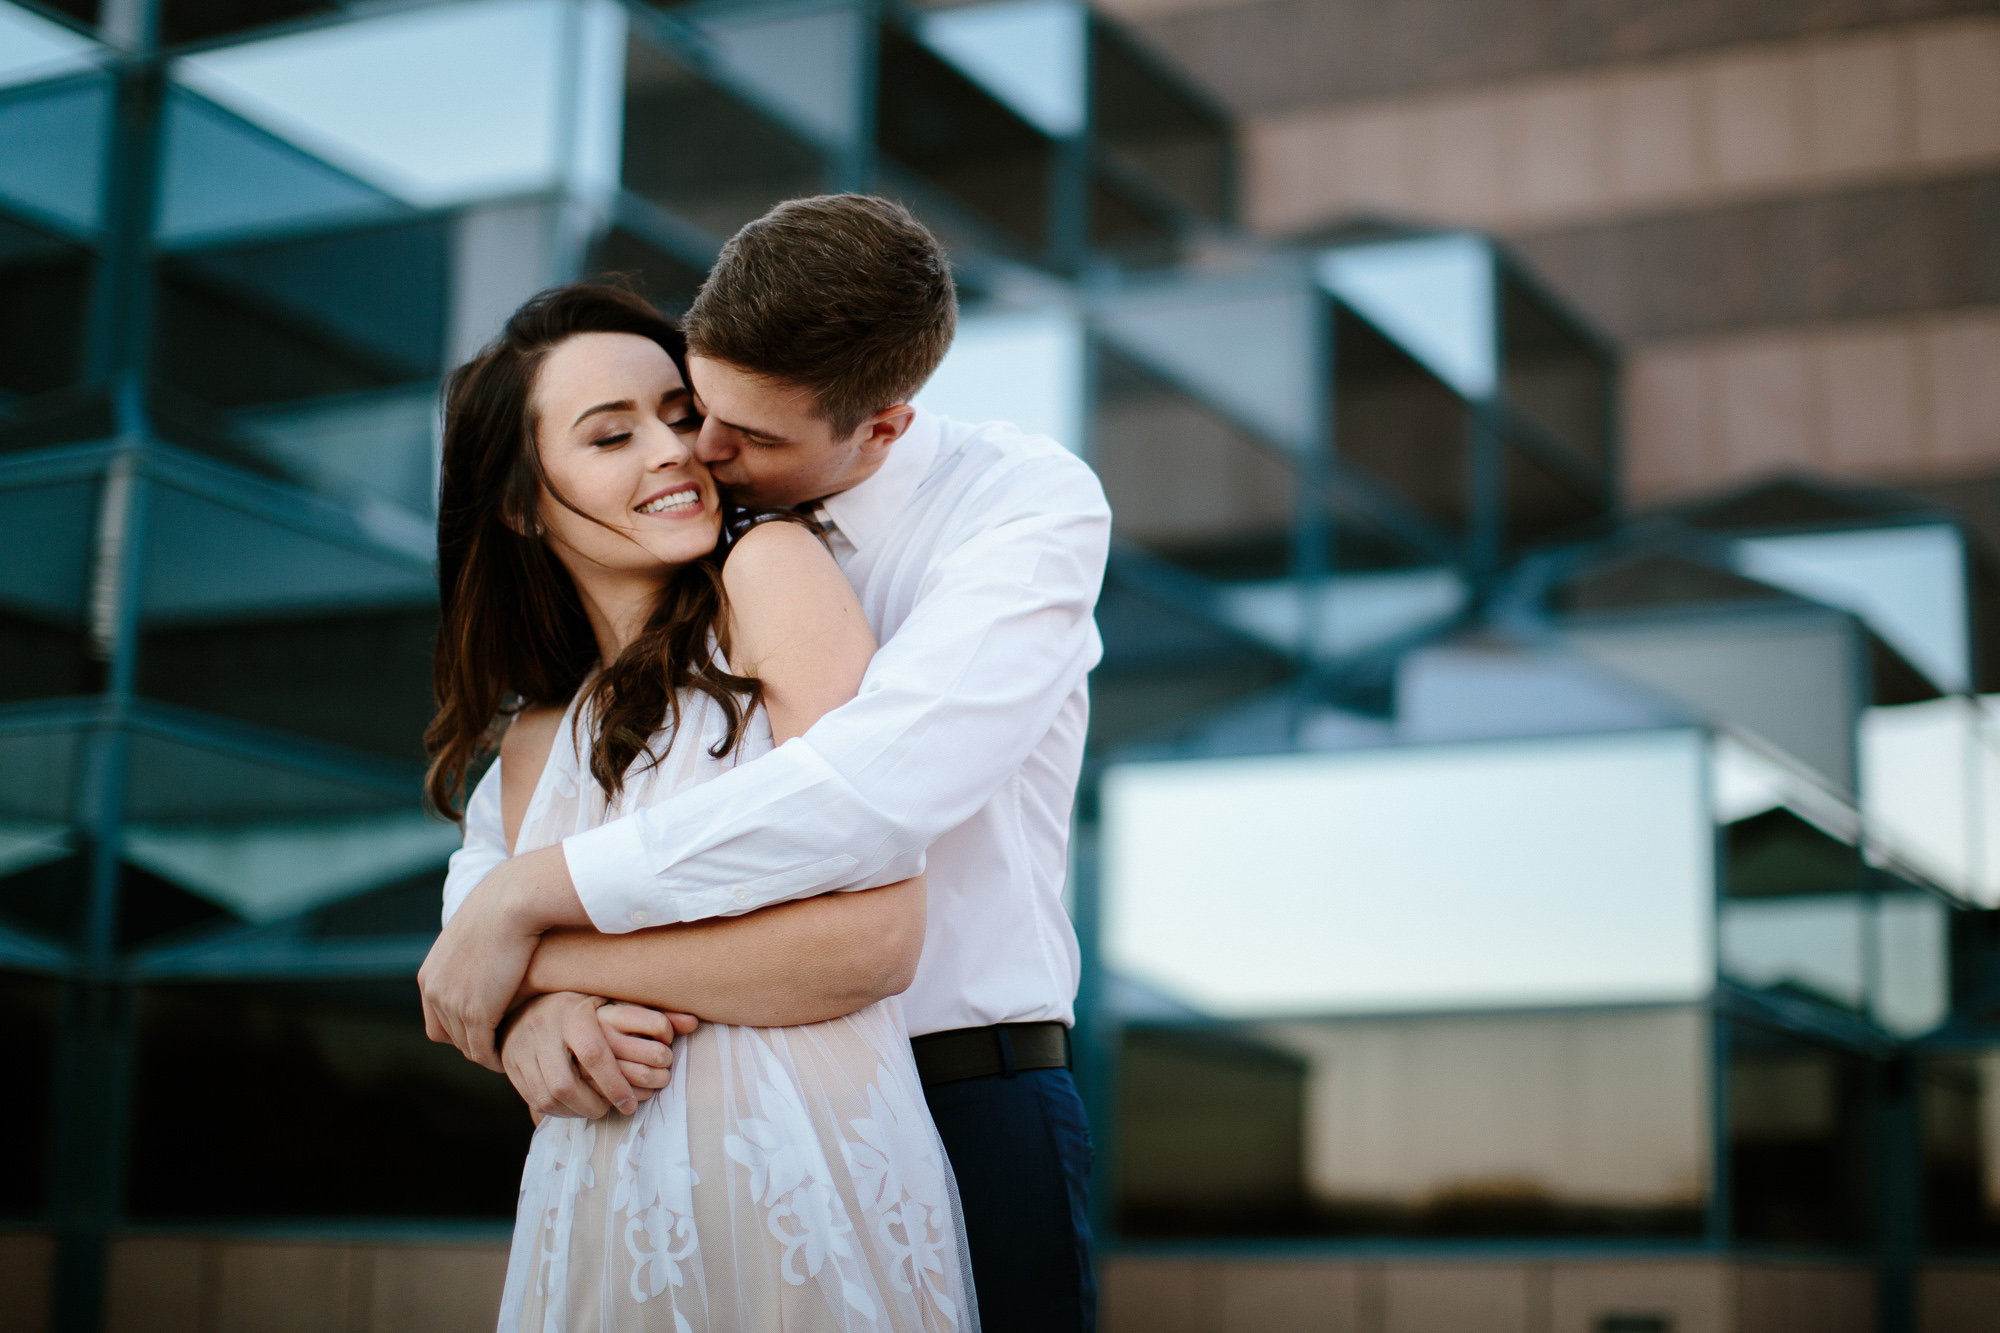 wedding-elopement-adventerous-romantic-timeless-des-moines-siouxfalls-photography-23.jpg